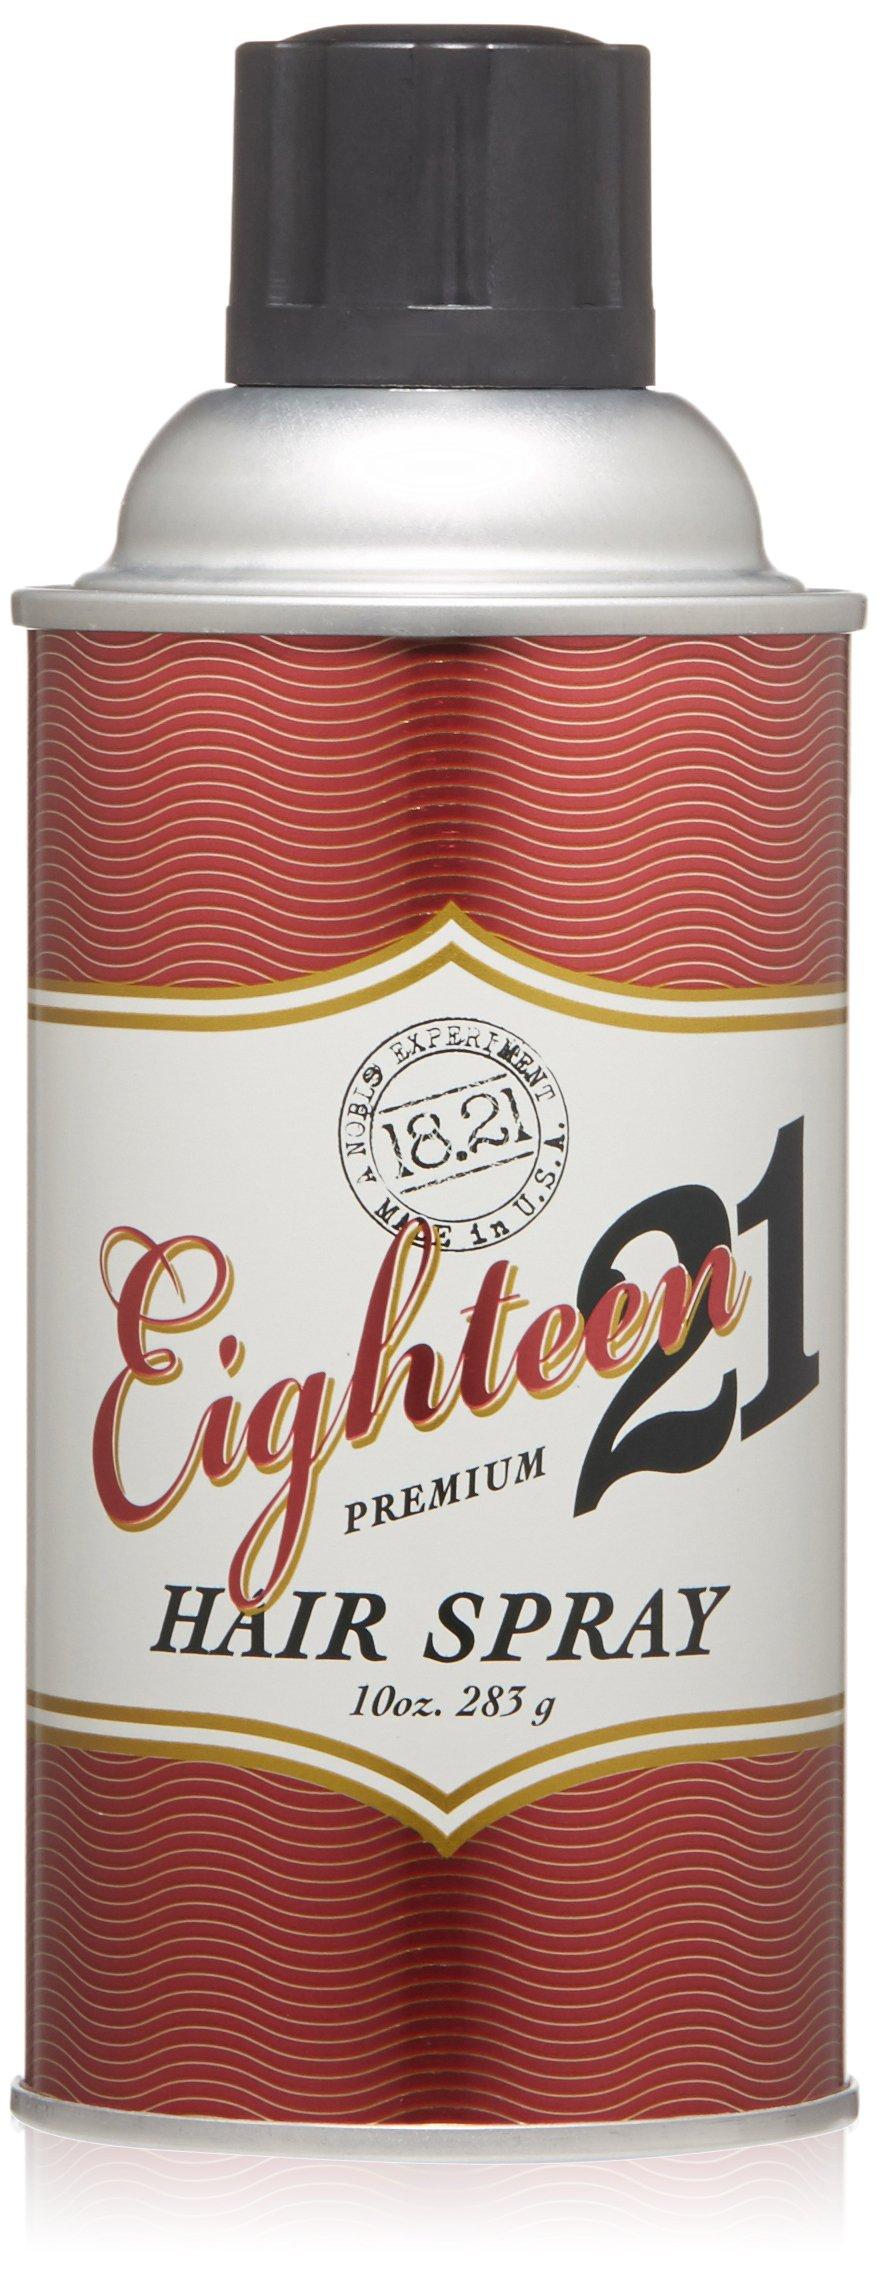 18.21 Man Made Premium Hair Spray, 10 oz